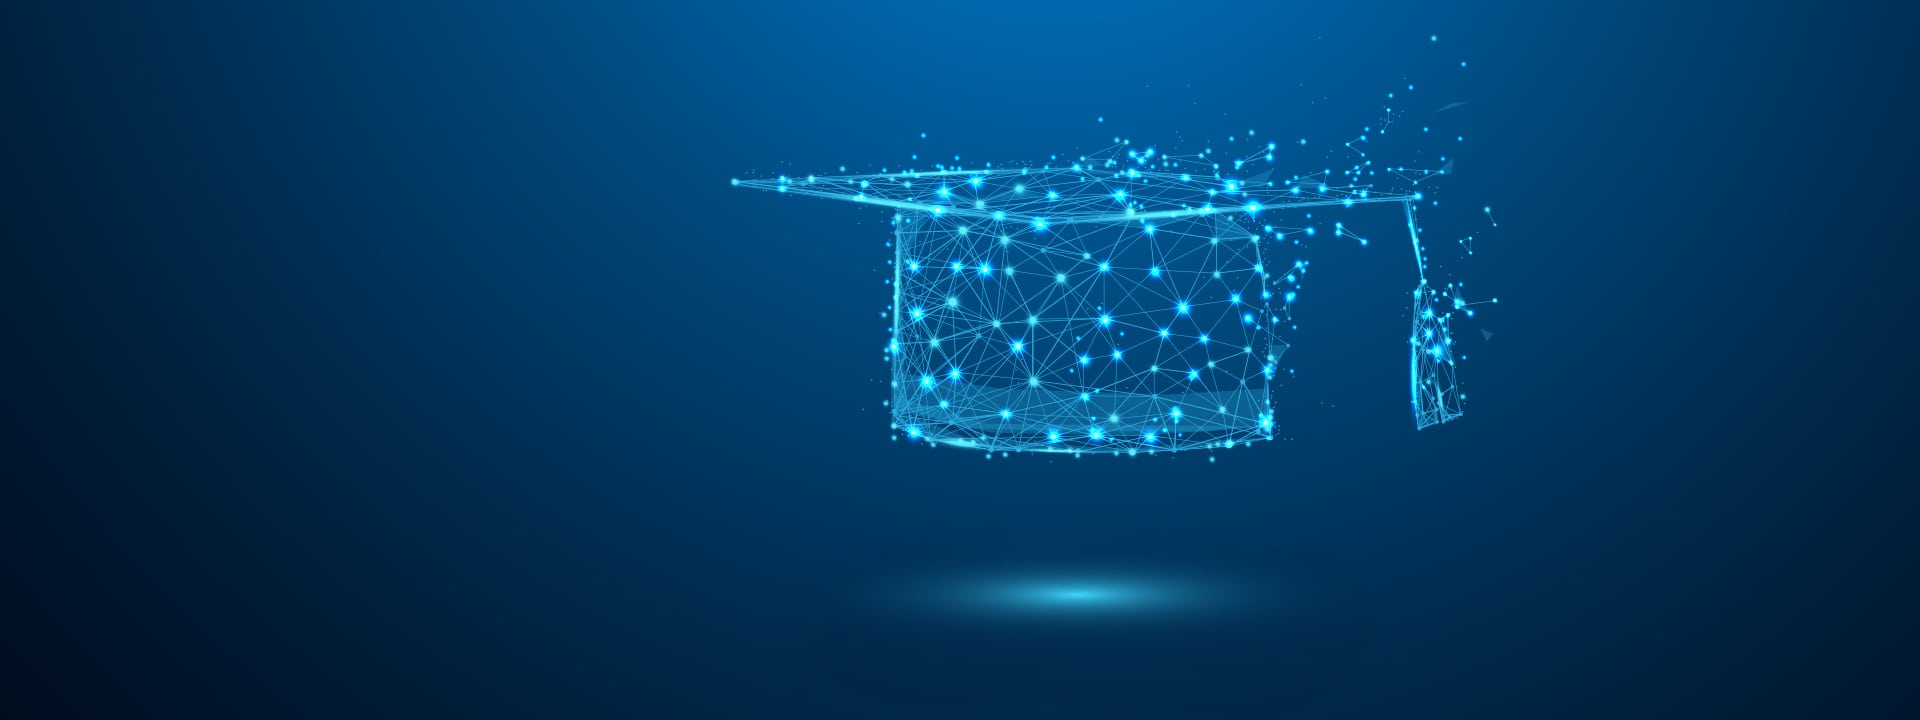 AI Use Cases for Universities BG v1.0